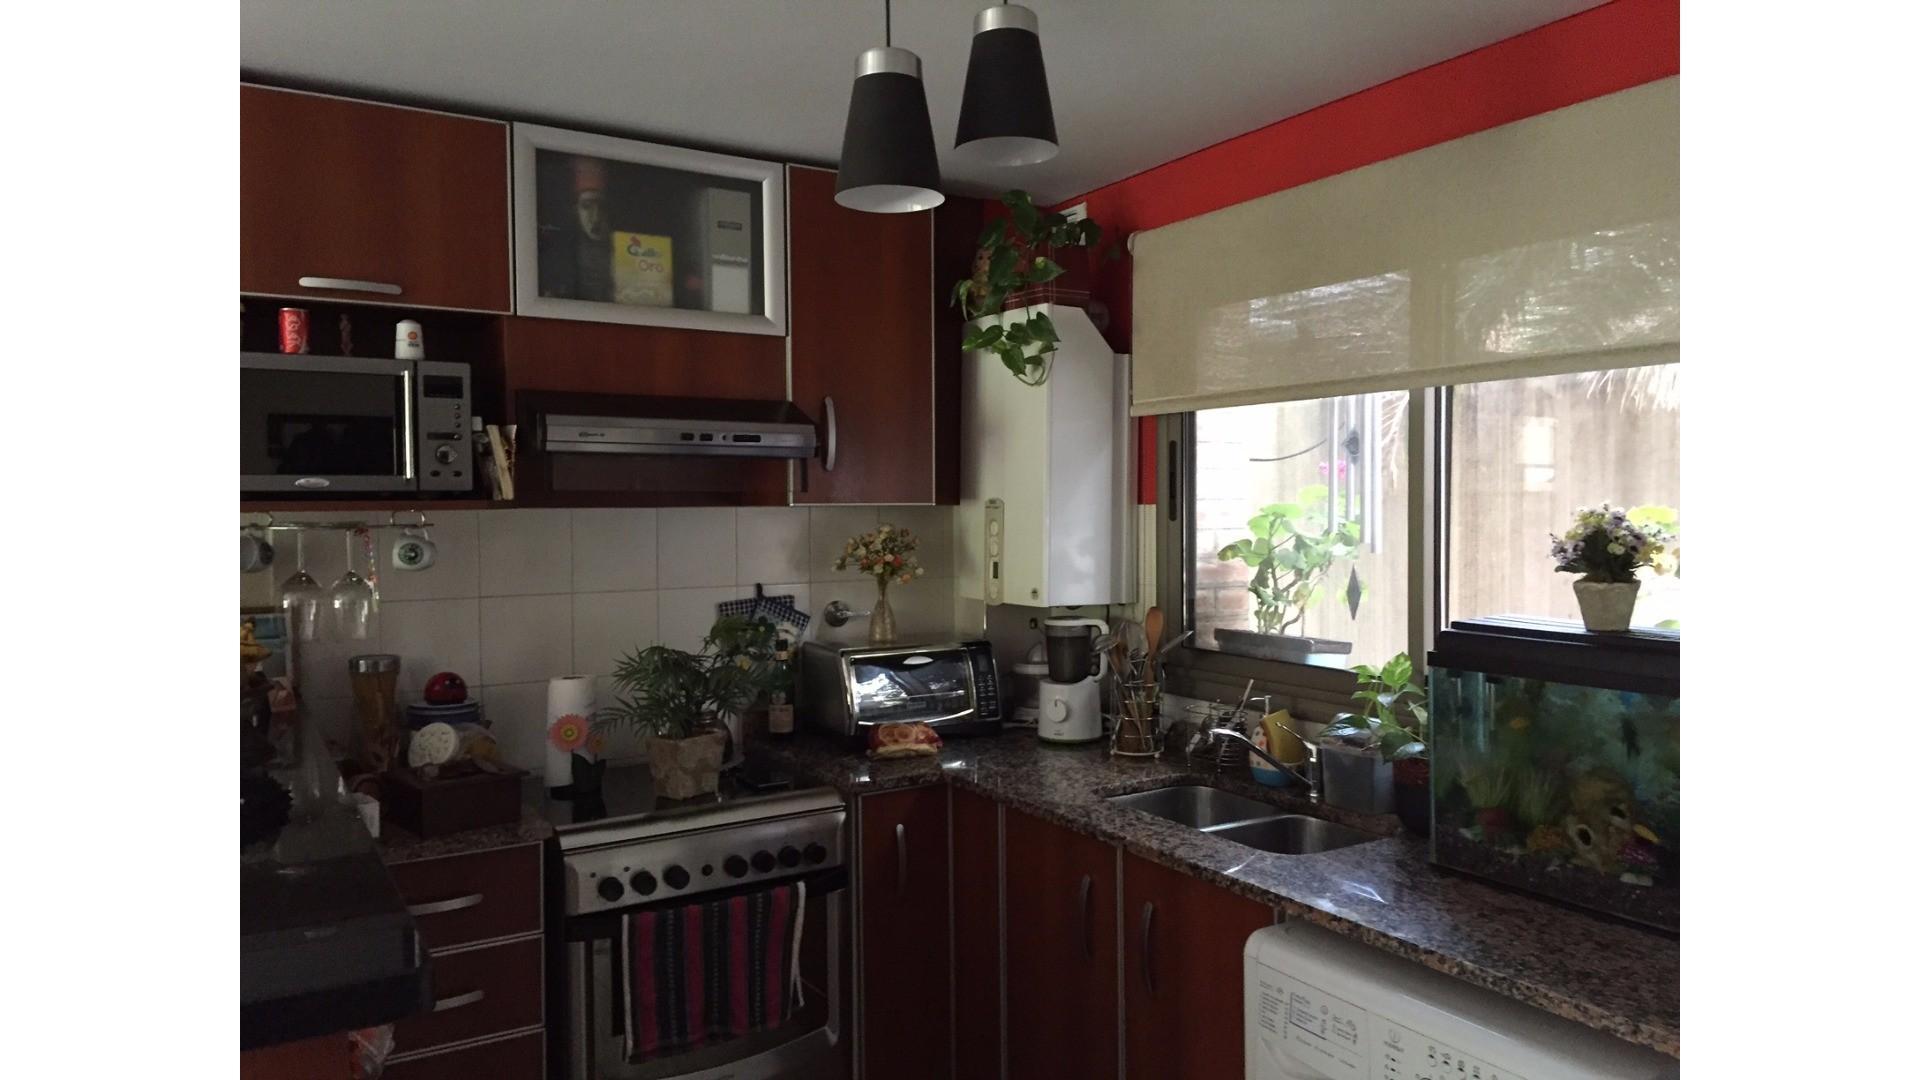 Duplex de 3 ambientes - Bernal Centro